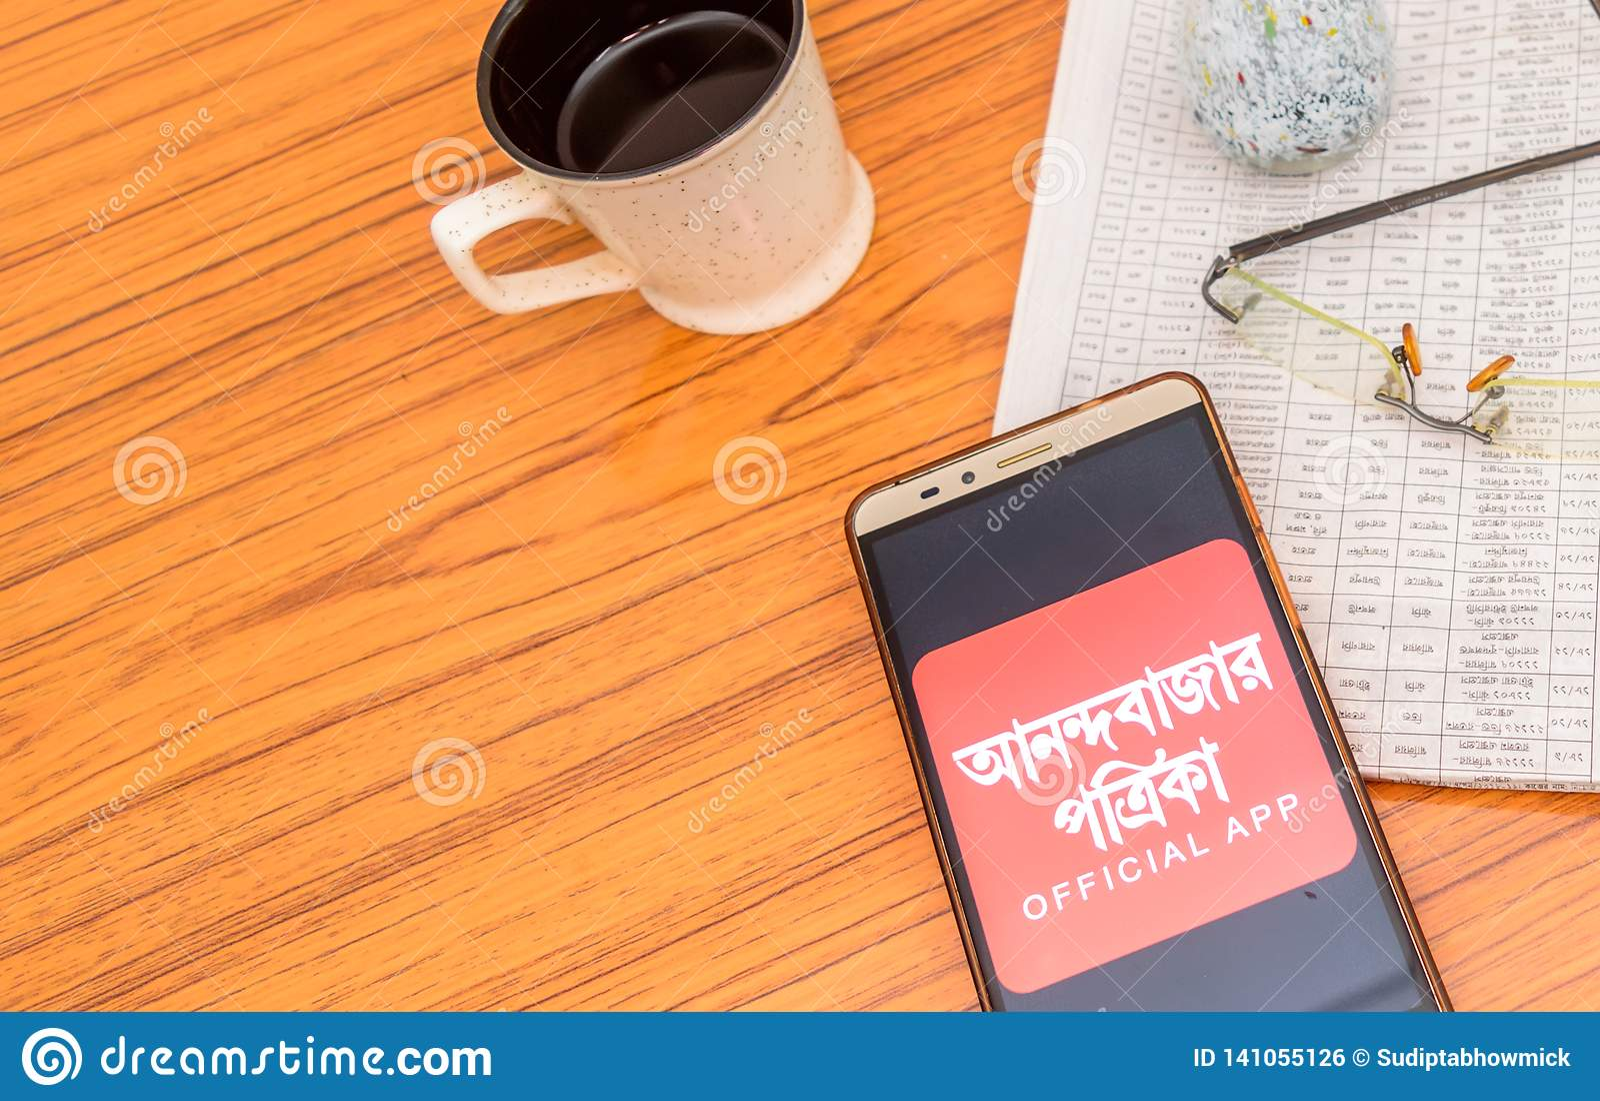 Kolkata, India, February 3, 2019: Anandabazar Patrika Bengali News